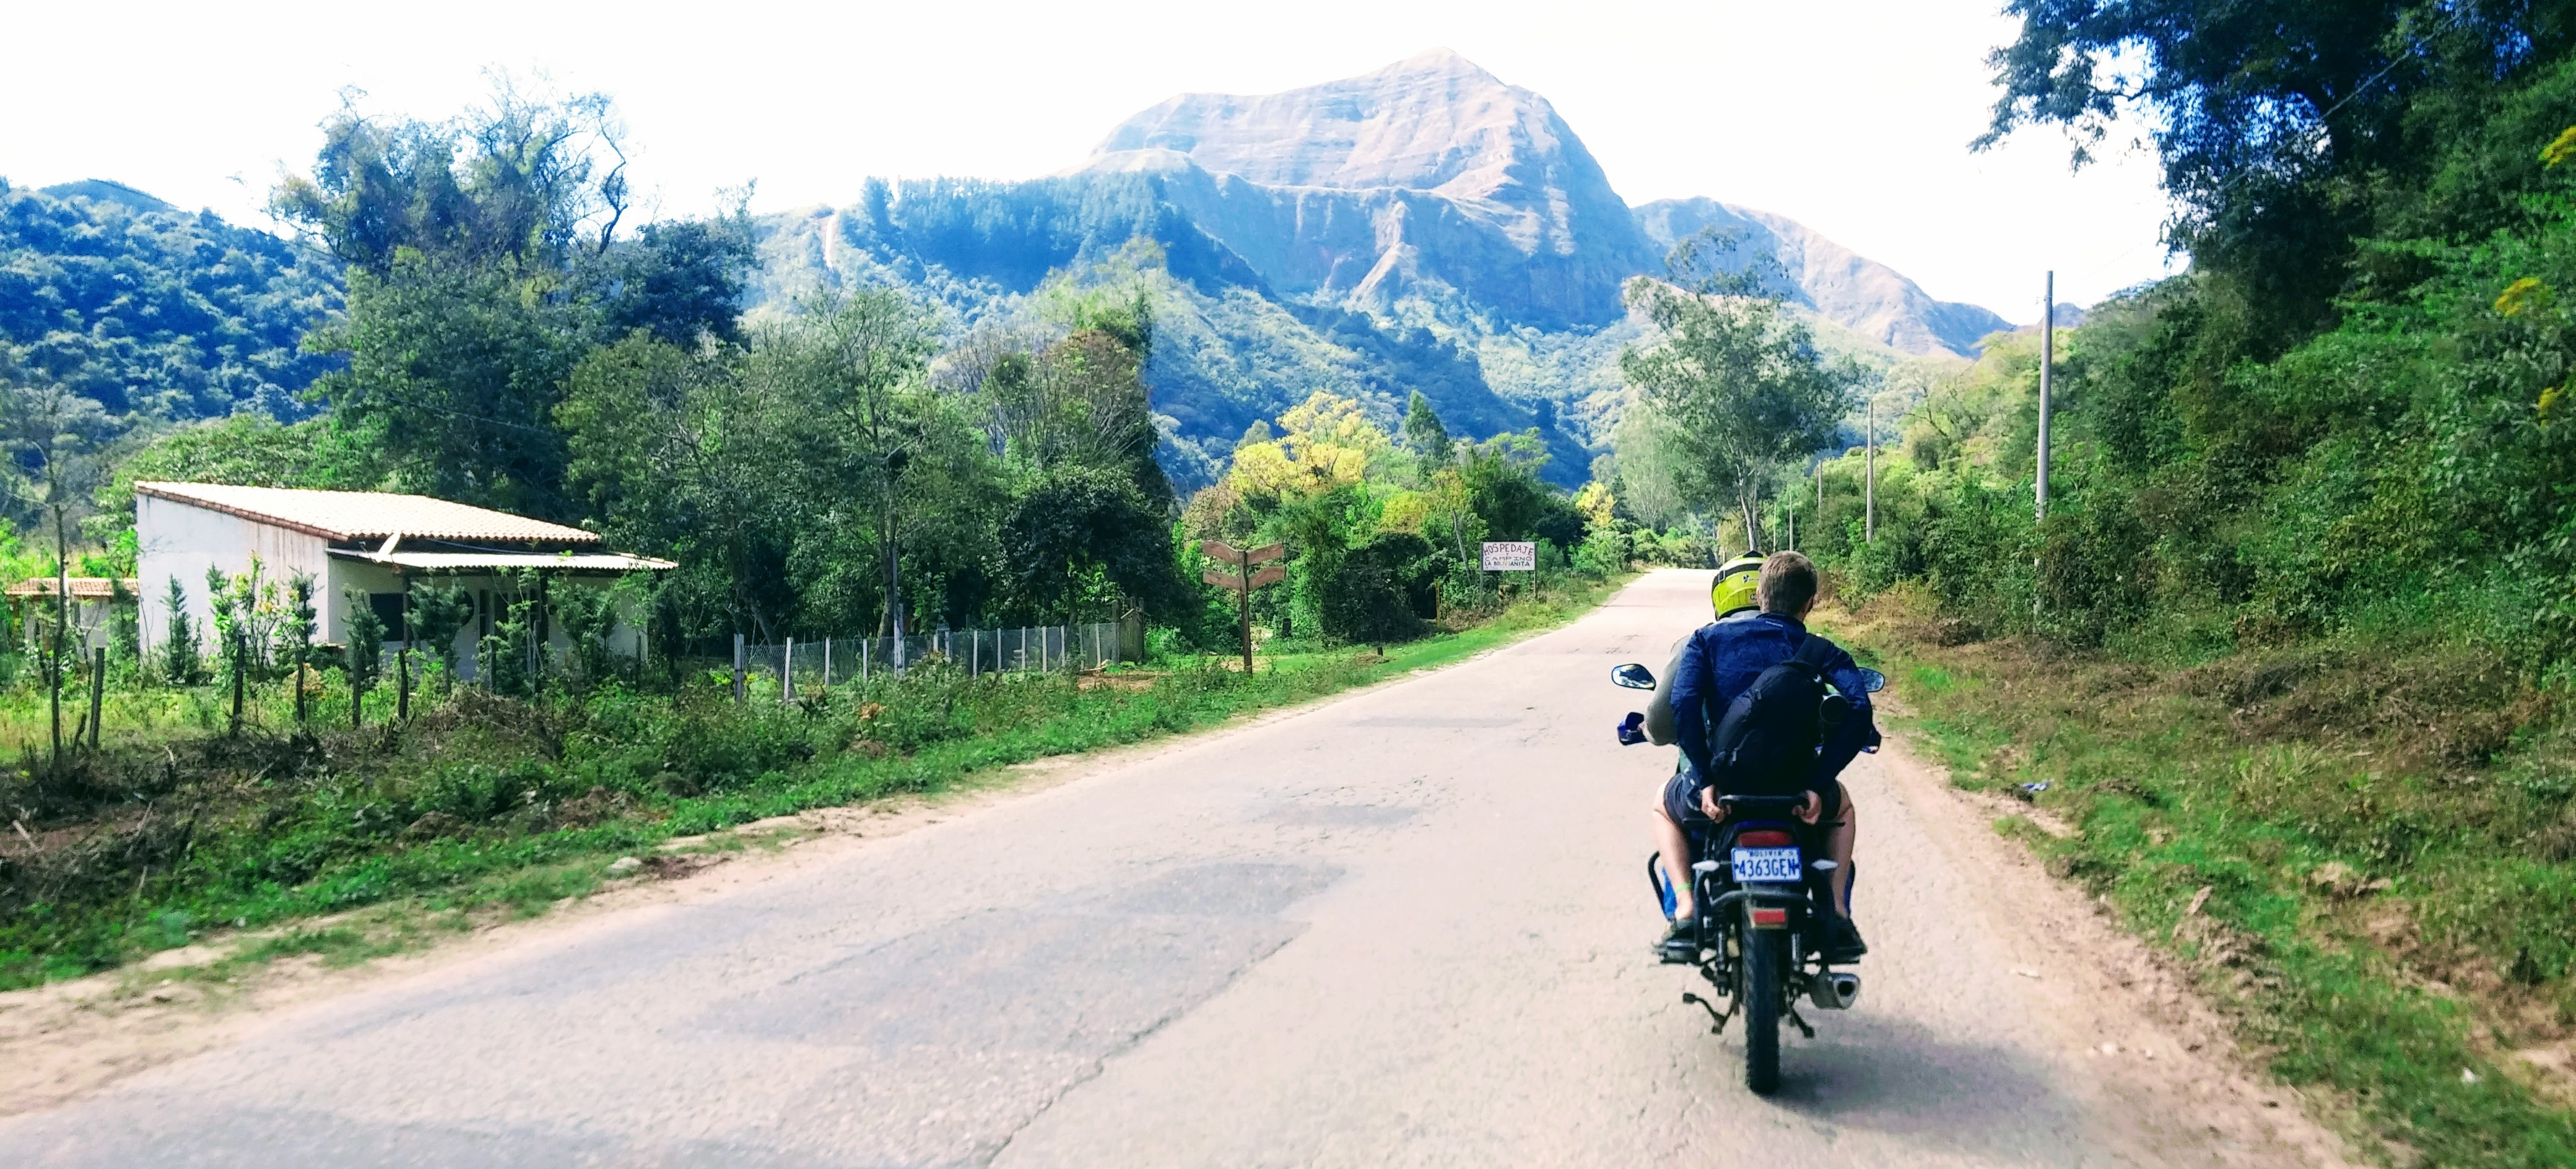 SEES takes a Samaipata mototaxi